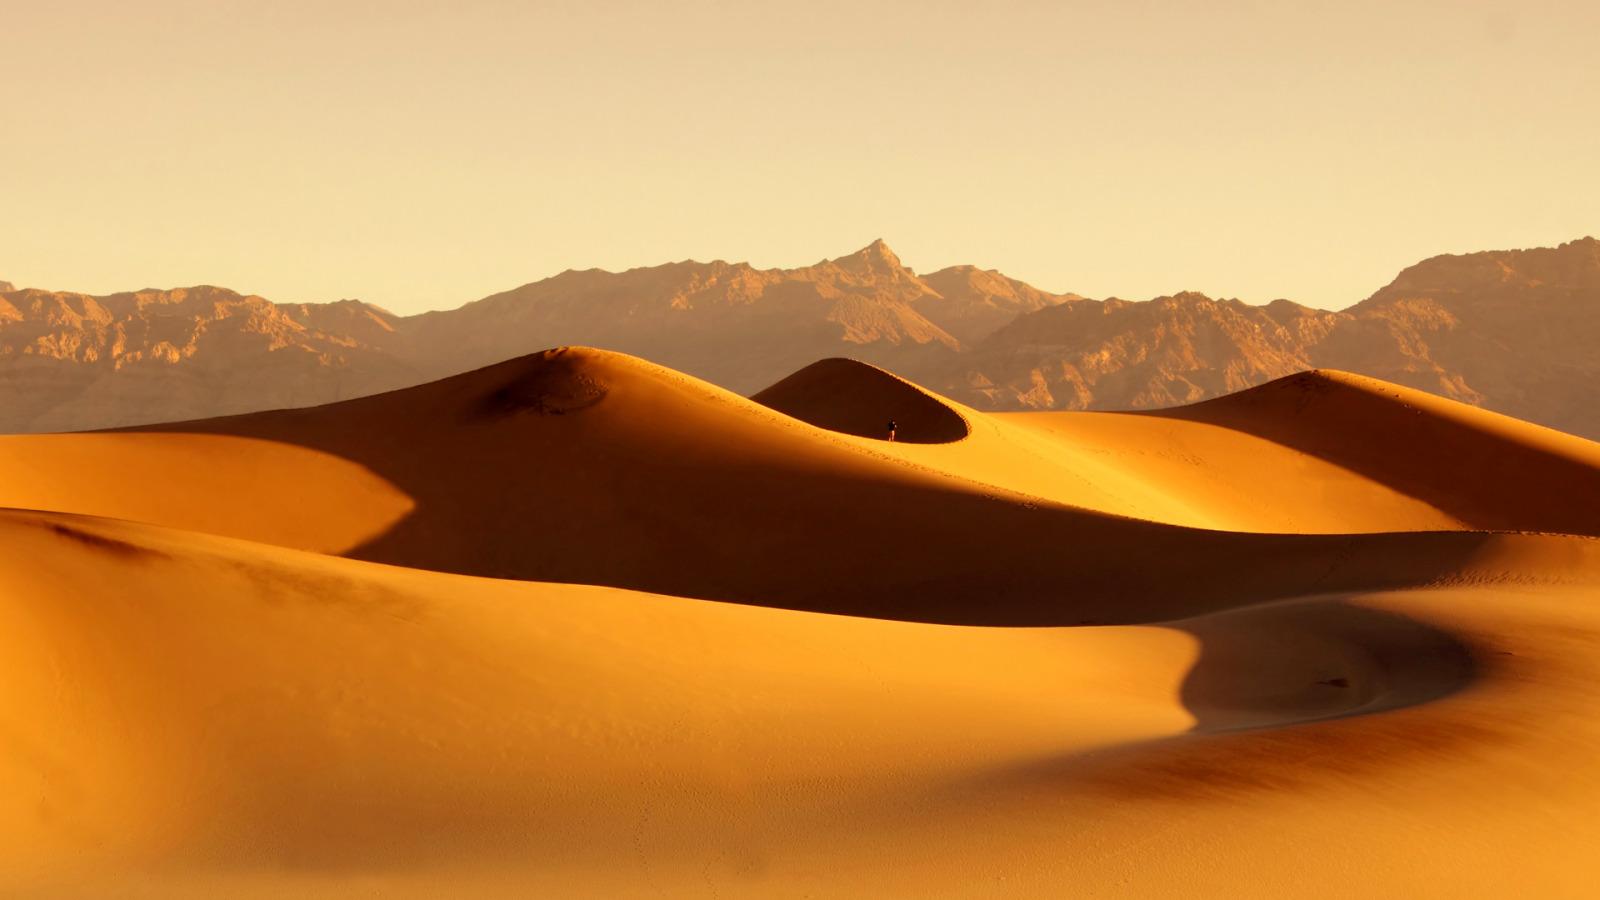 барханы пустыня дюны  № 1291915 бесплатно